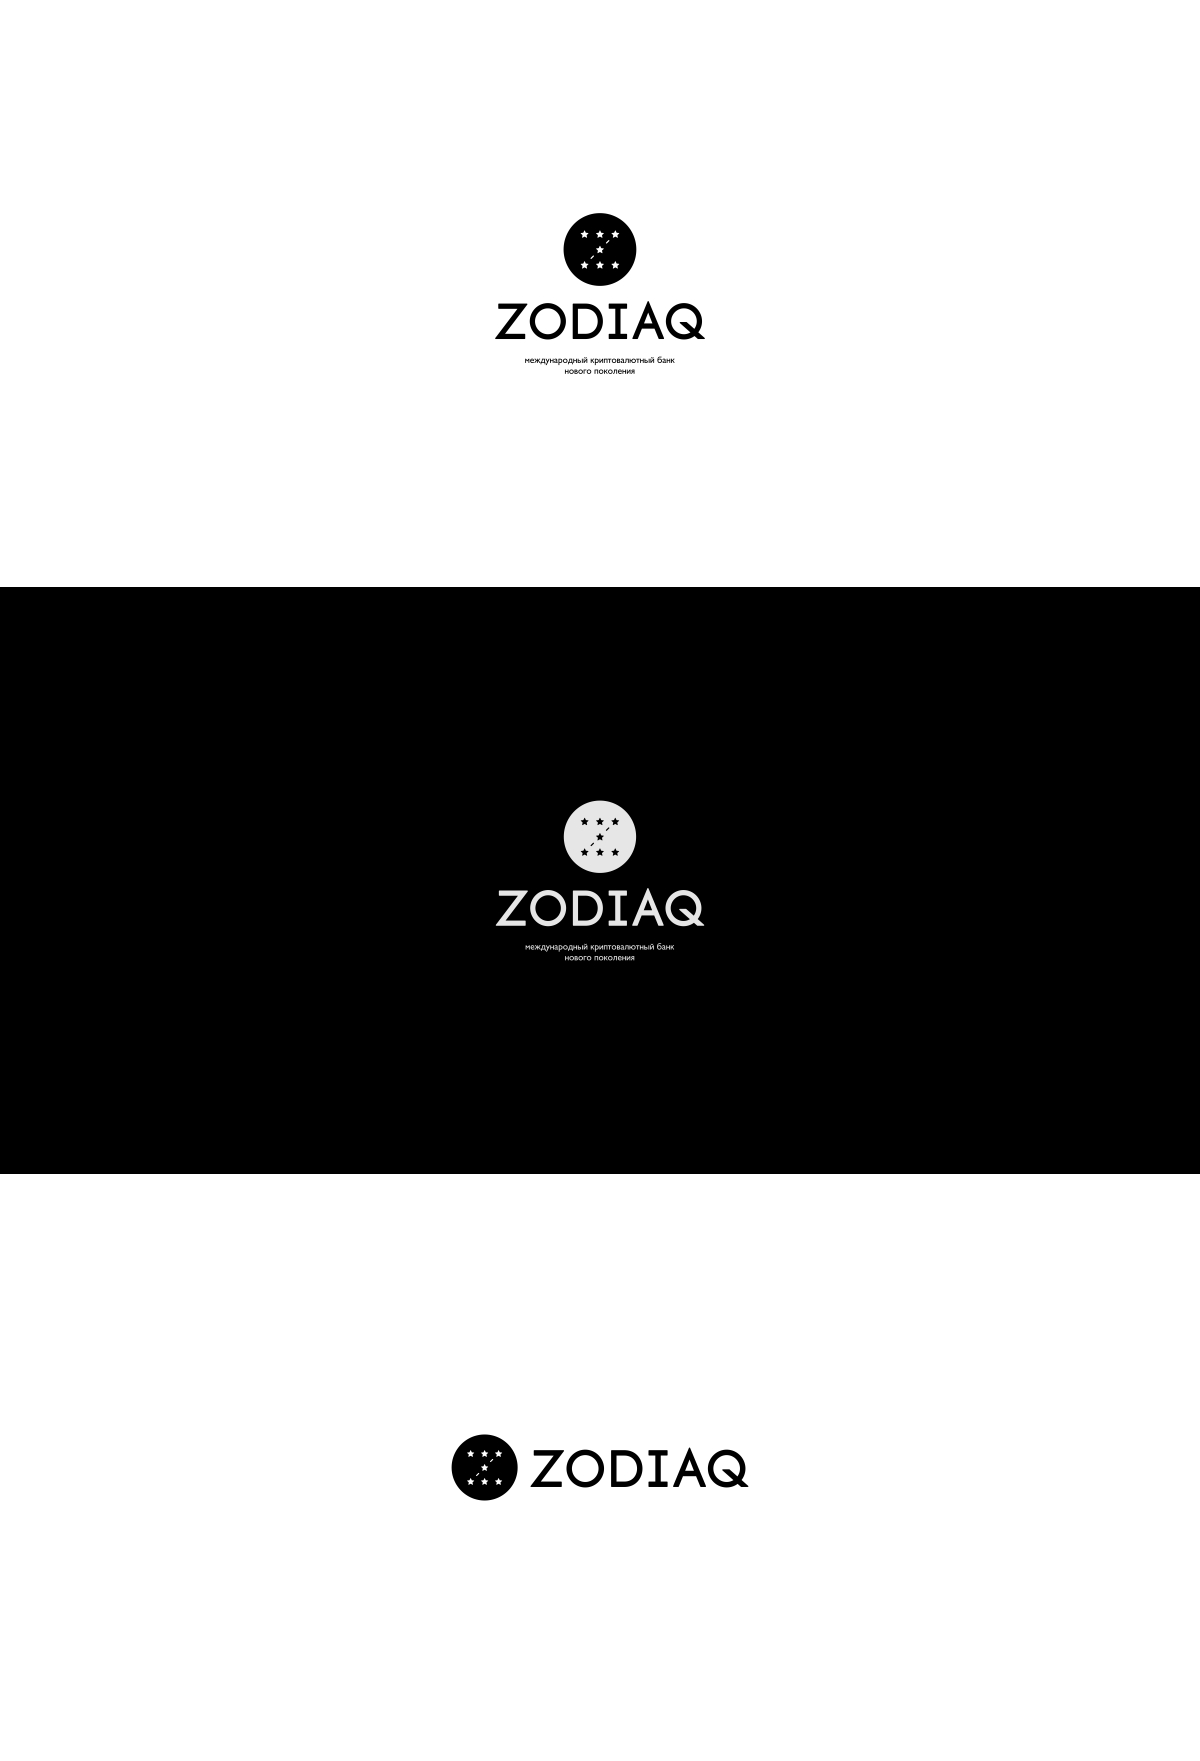 Разработка логотипа и основных элементов стиля фото f_703598dbc6e47b71.jpg